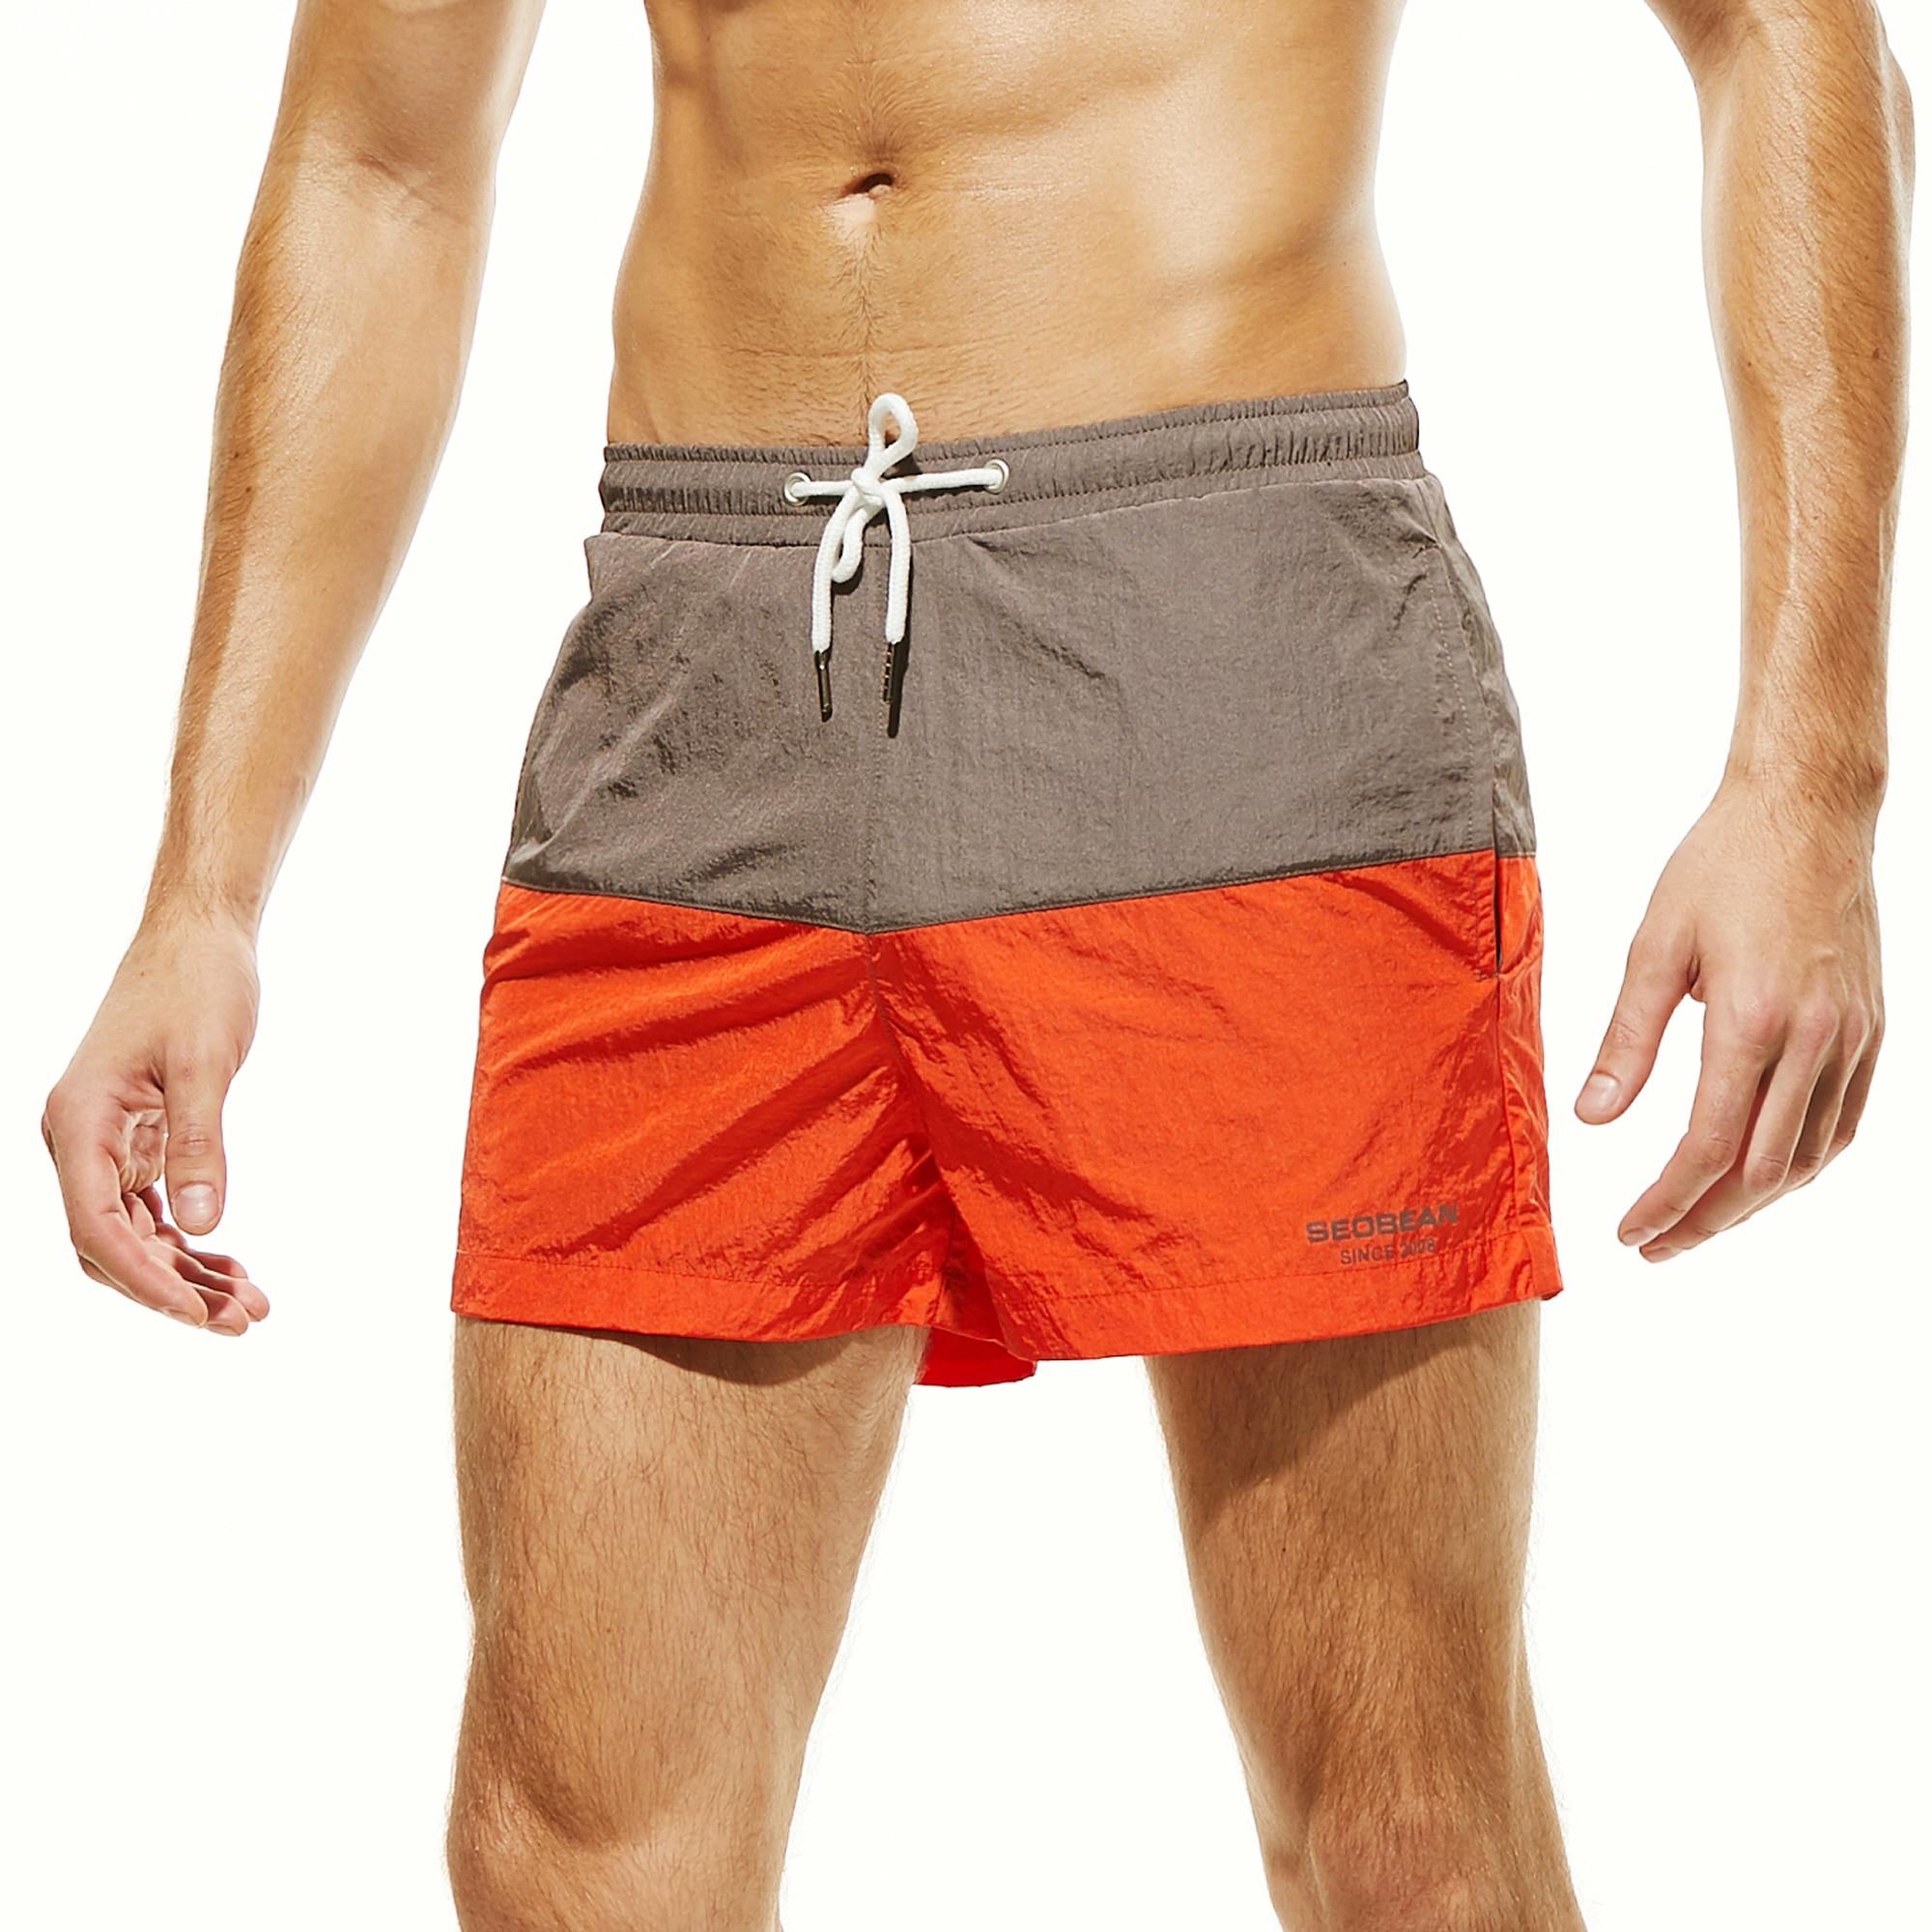 Clearance SaleïBermuda Shorts Swimsuit Surf Sport Gym Man Men Quick-Dry Men's New-Brand